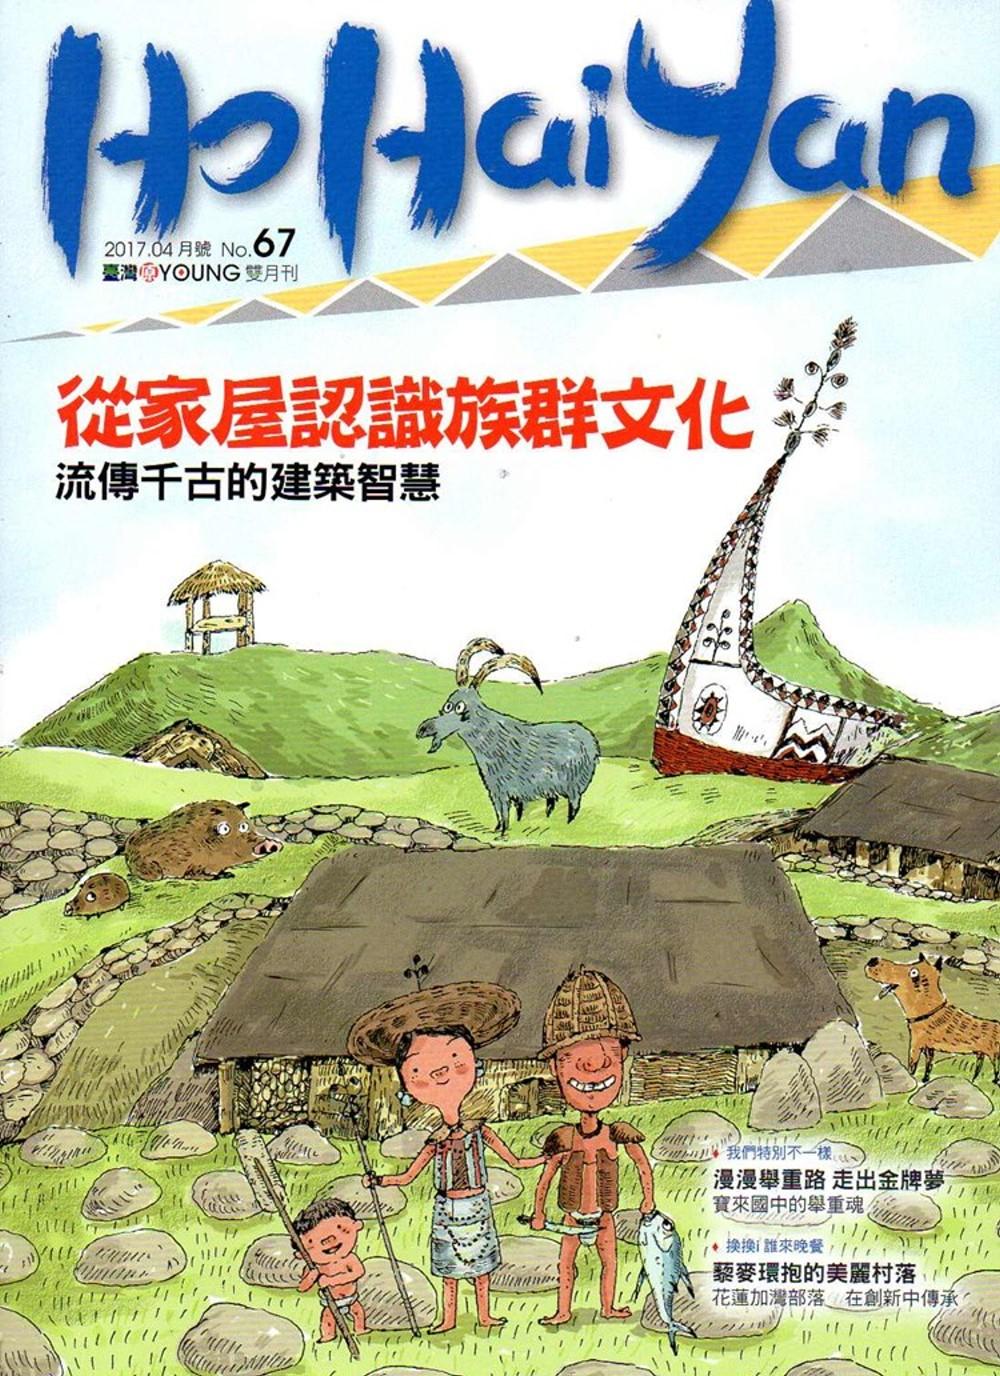 Ho Hai Yan台灣原YOUNG原住民青少年雜誌雙月刊2017.4 NO.67